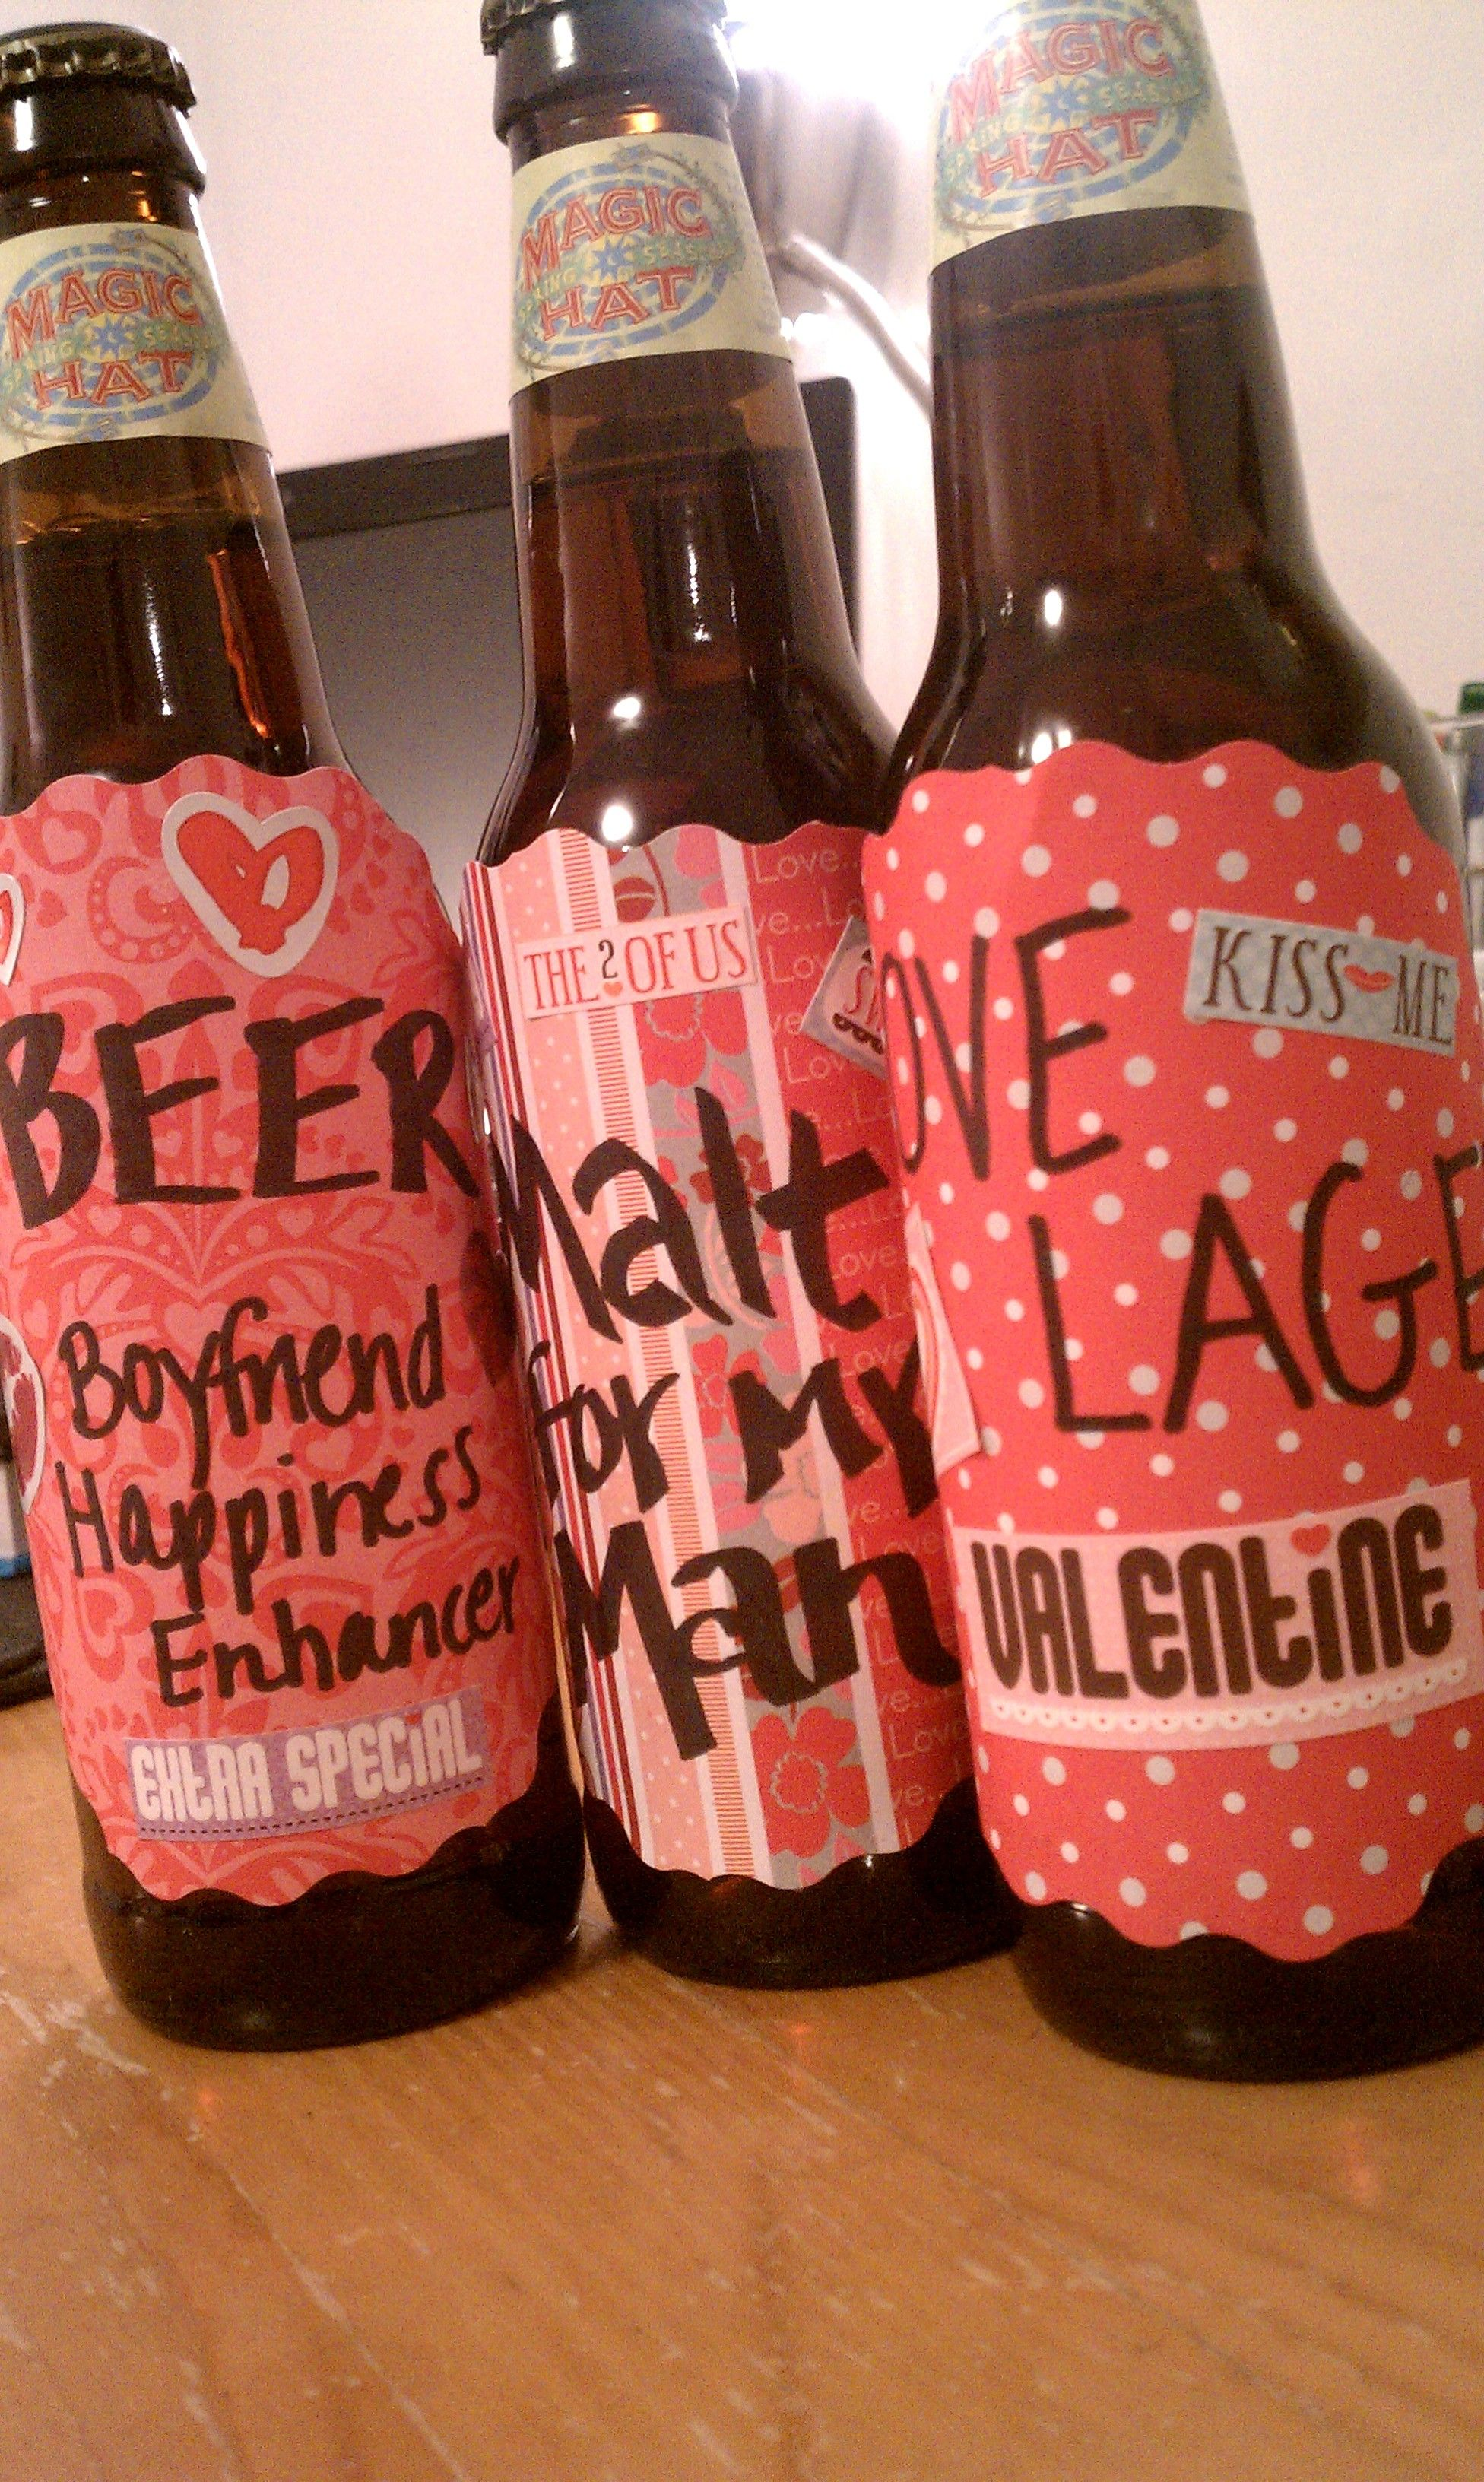 DIY Valentineu0027s Day Gift: Customized Beer Bottles U2013 Achieve With Athena